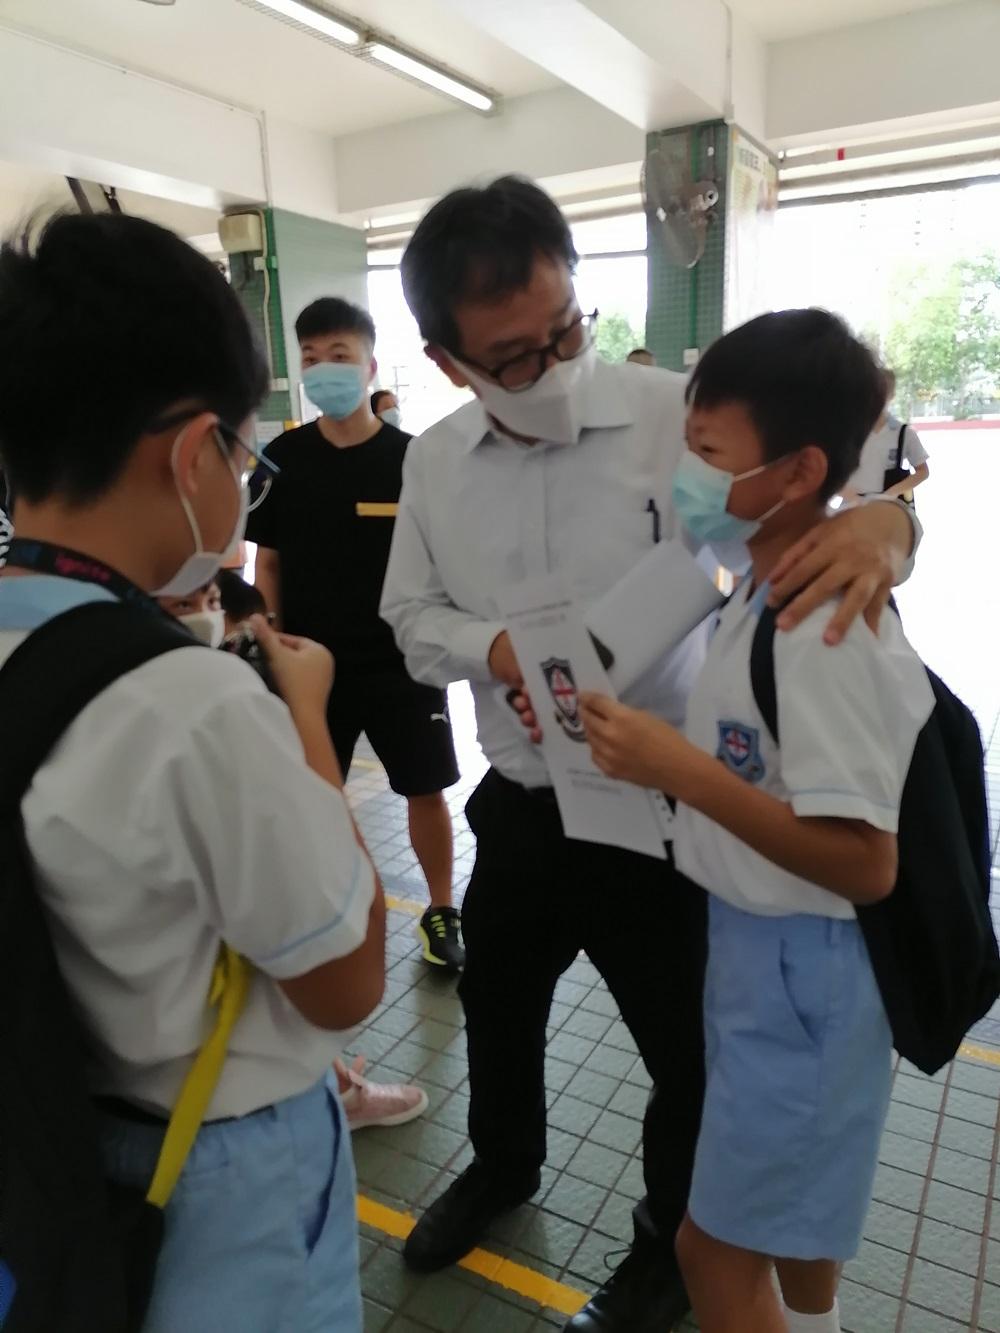 https://skhtswlo.edu.hk/sites/default/files/img_20200707_082125.jpg